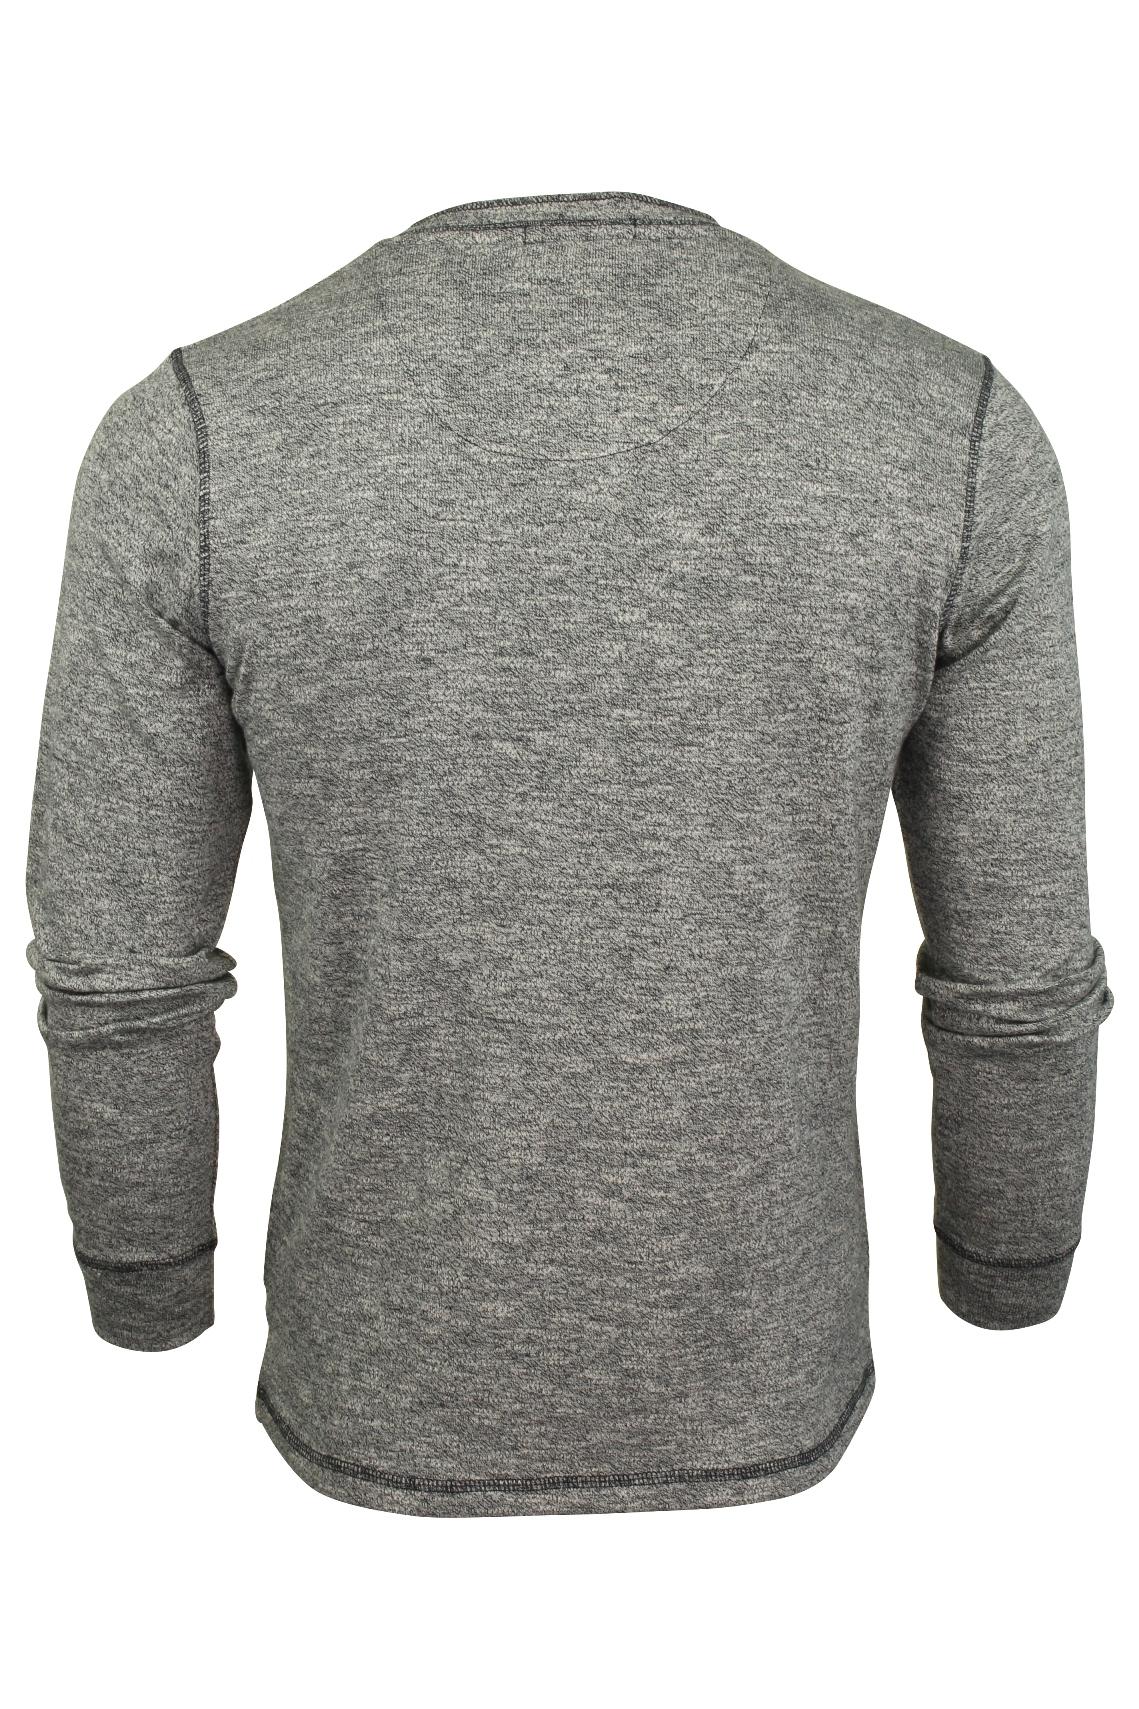 Mens-Long-Sleeve-Grandad-T-Shirt-by-Tokyo-Laundry-039-Roosevelt-039-Siro-Slub-Jersey thumbnail 5